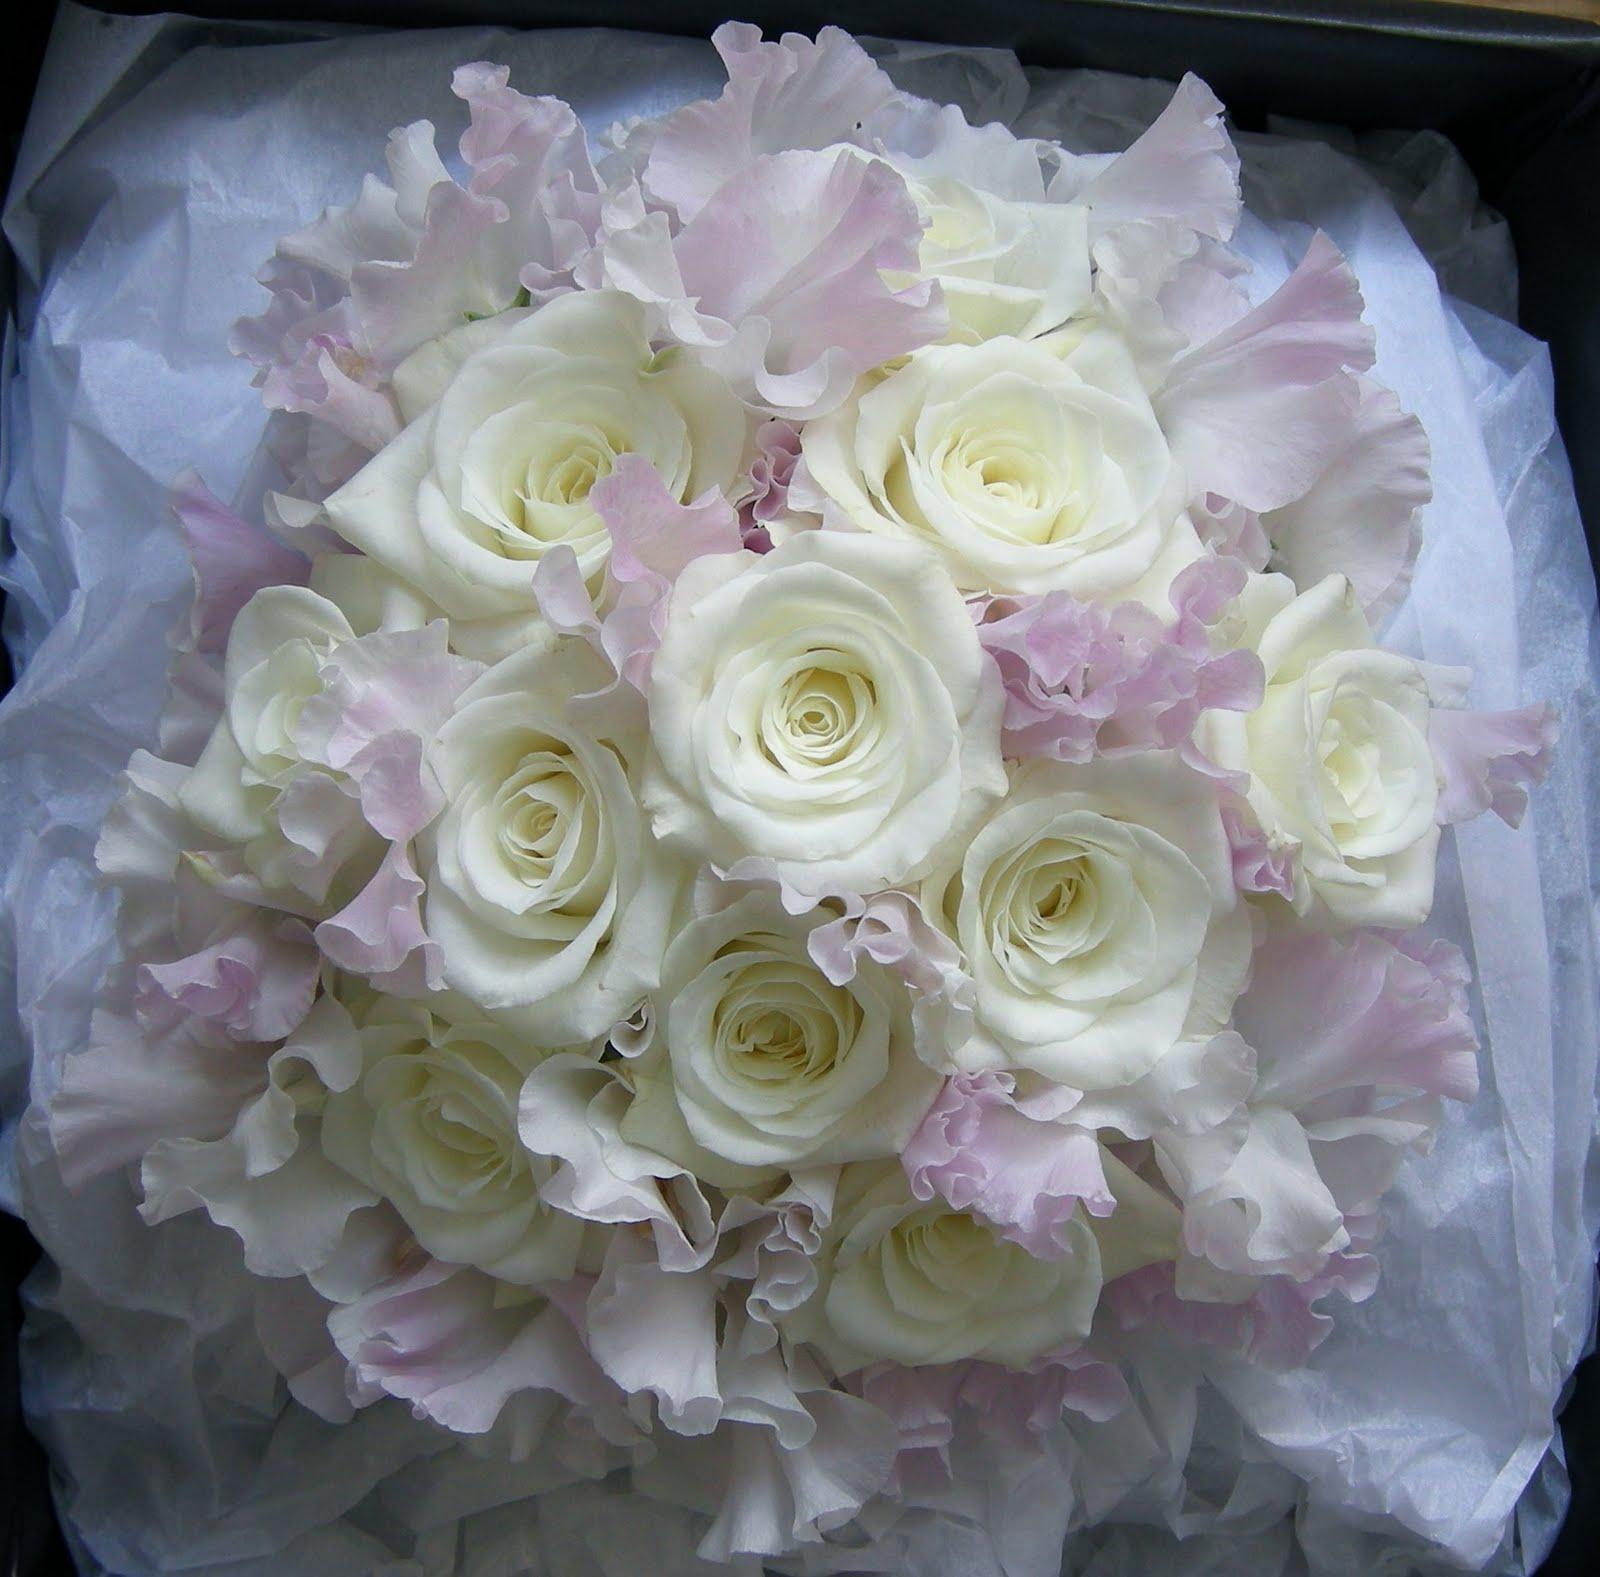 Wedding Flowers In February: Wedding Flowers Blog: February 2011